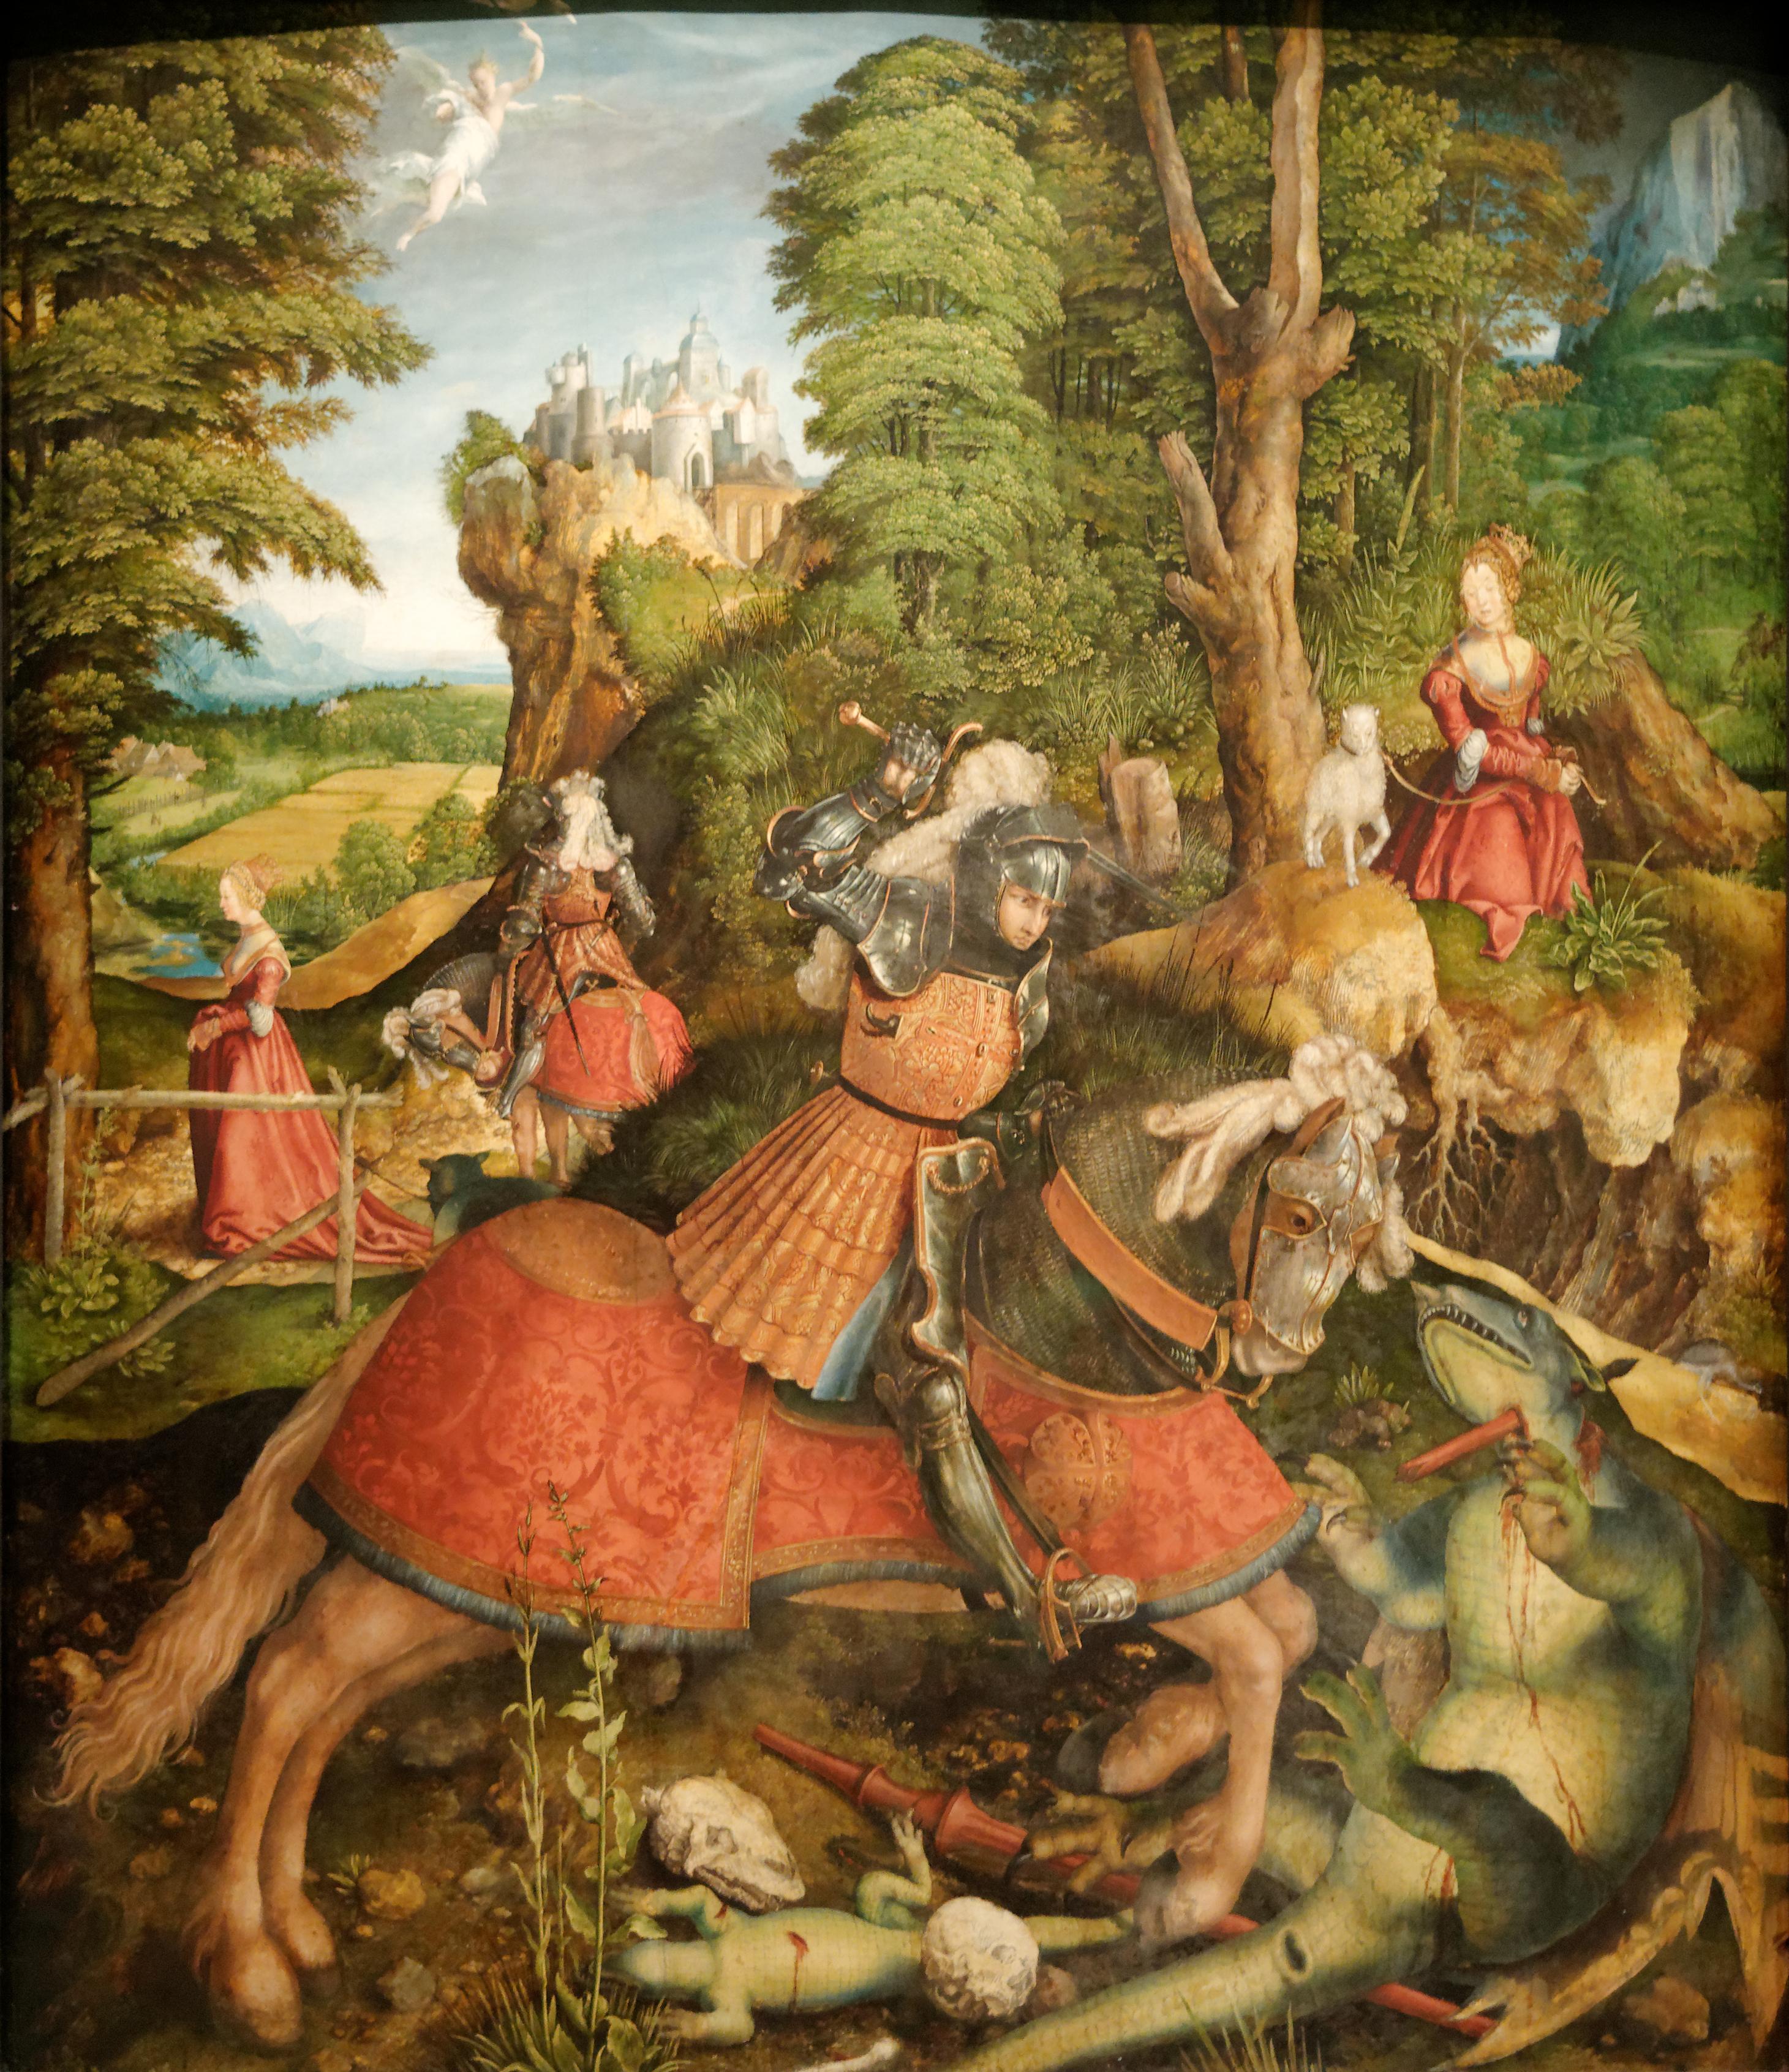 St_George_fighting_the_dragon_Leonhard_Beck 1515 Kunsthistorisches Museum